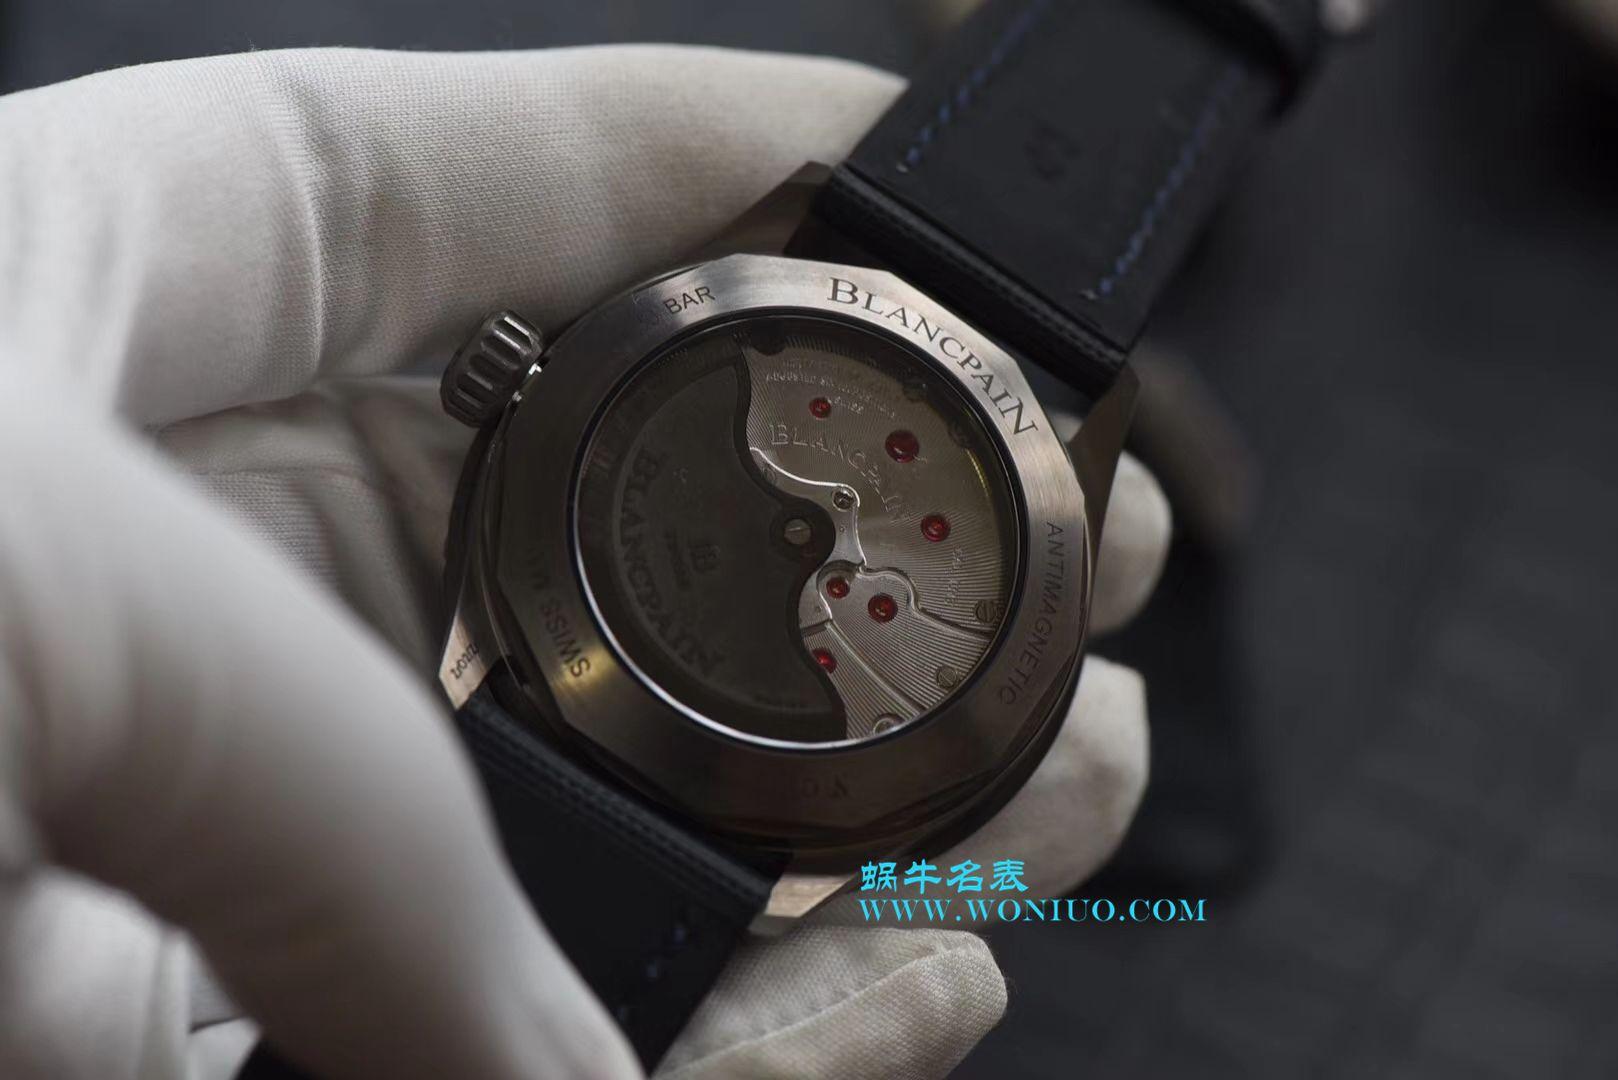 【ZF一比一超A高仿手表】宝珀五十噚系列5000-0240-O52A腕表 / BP051